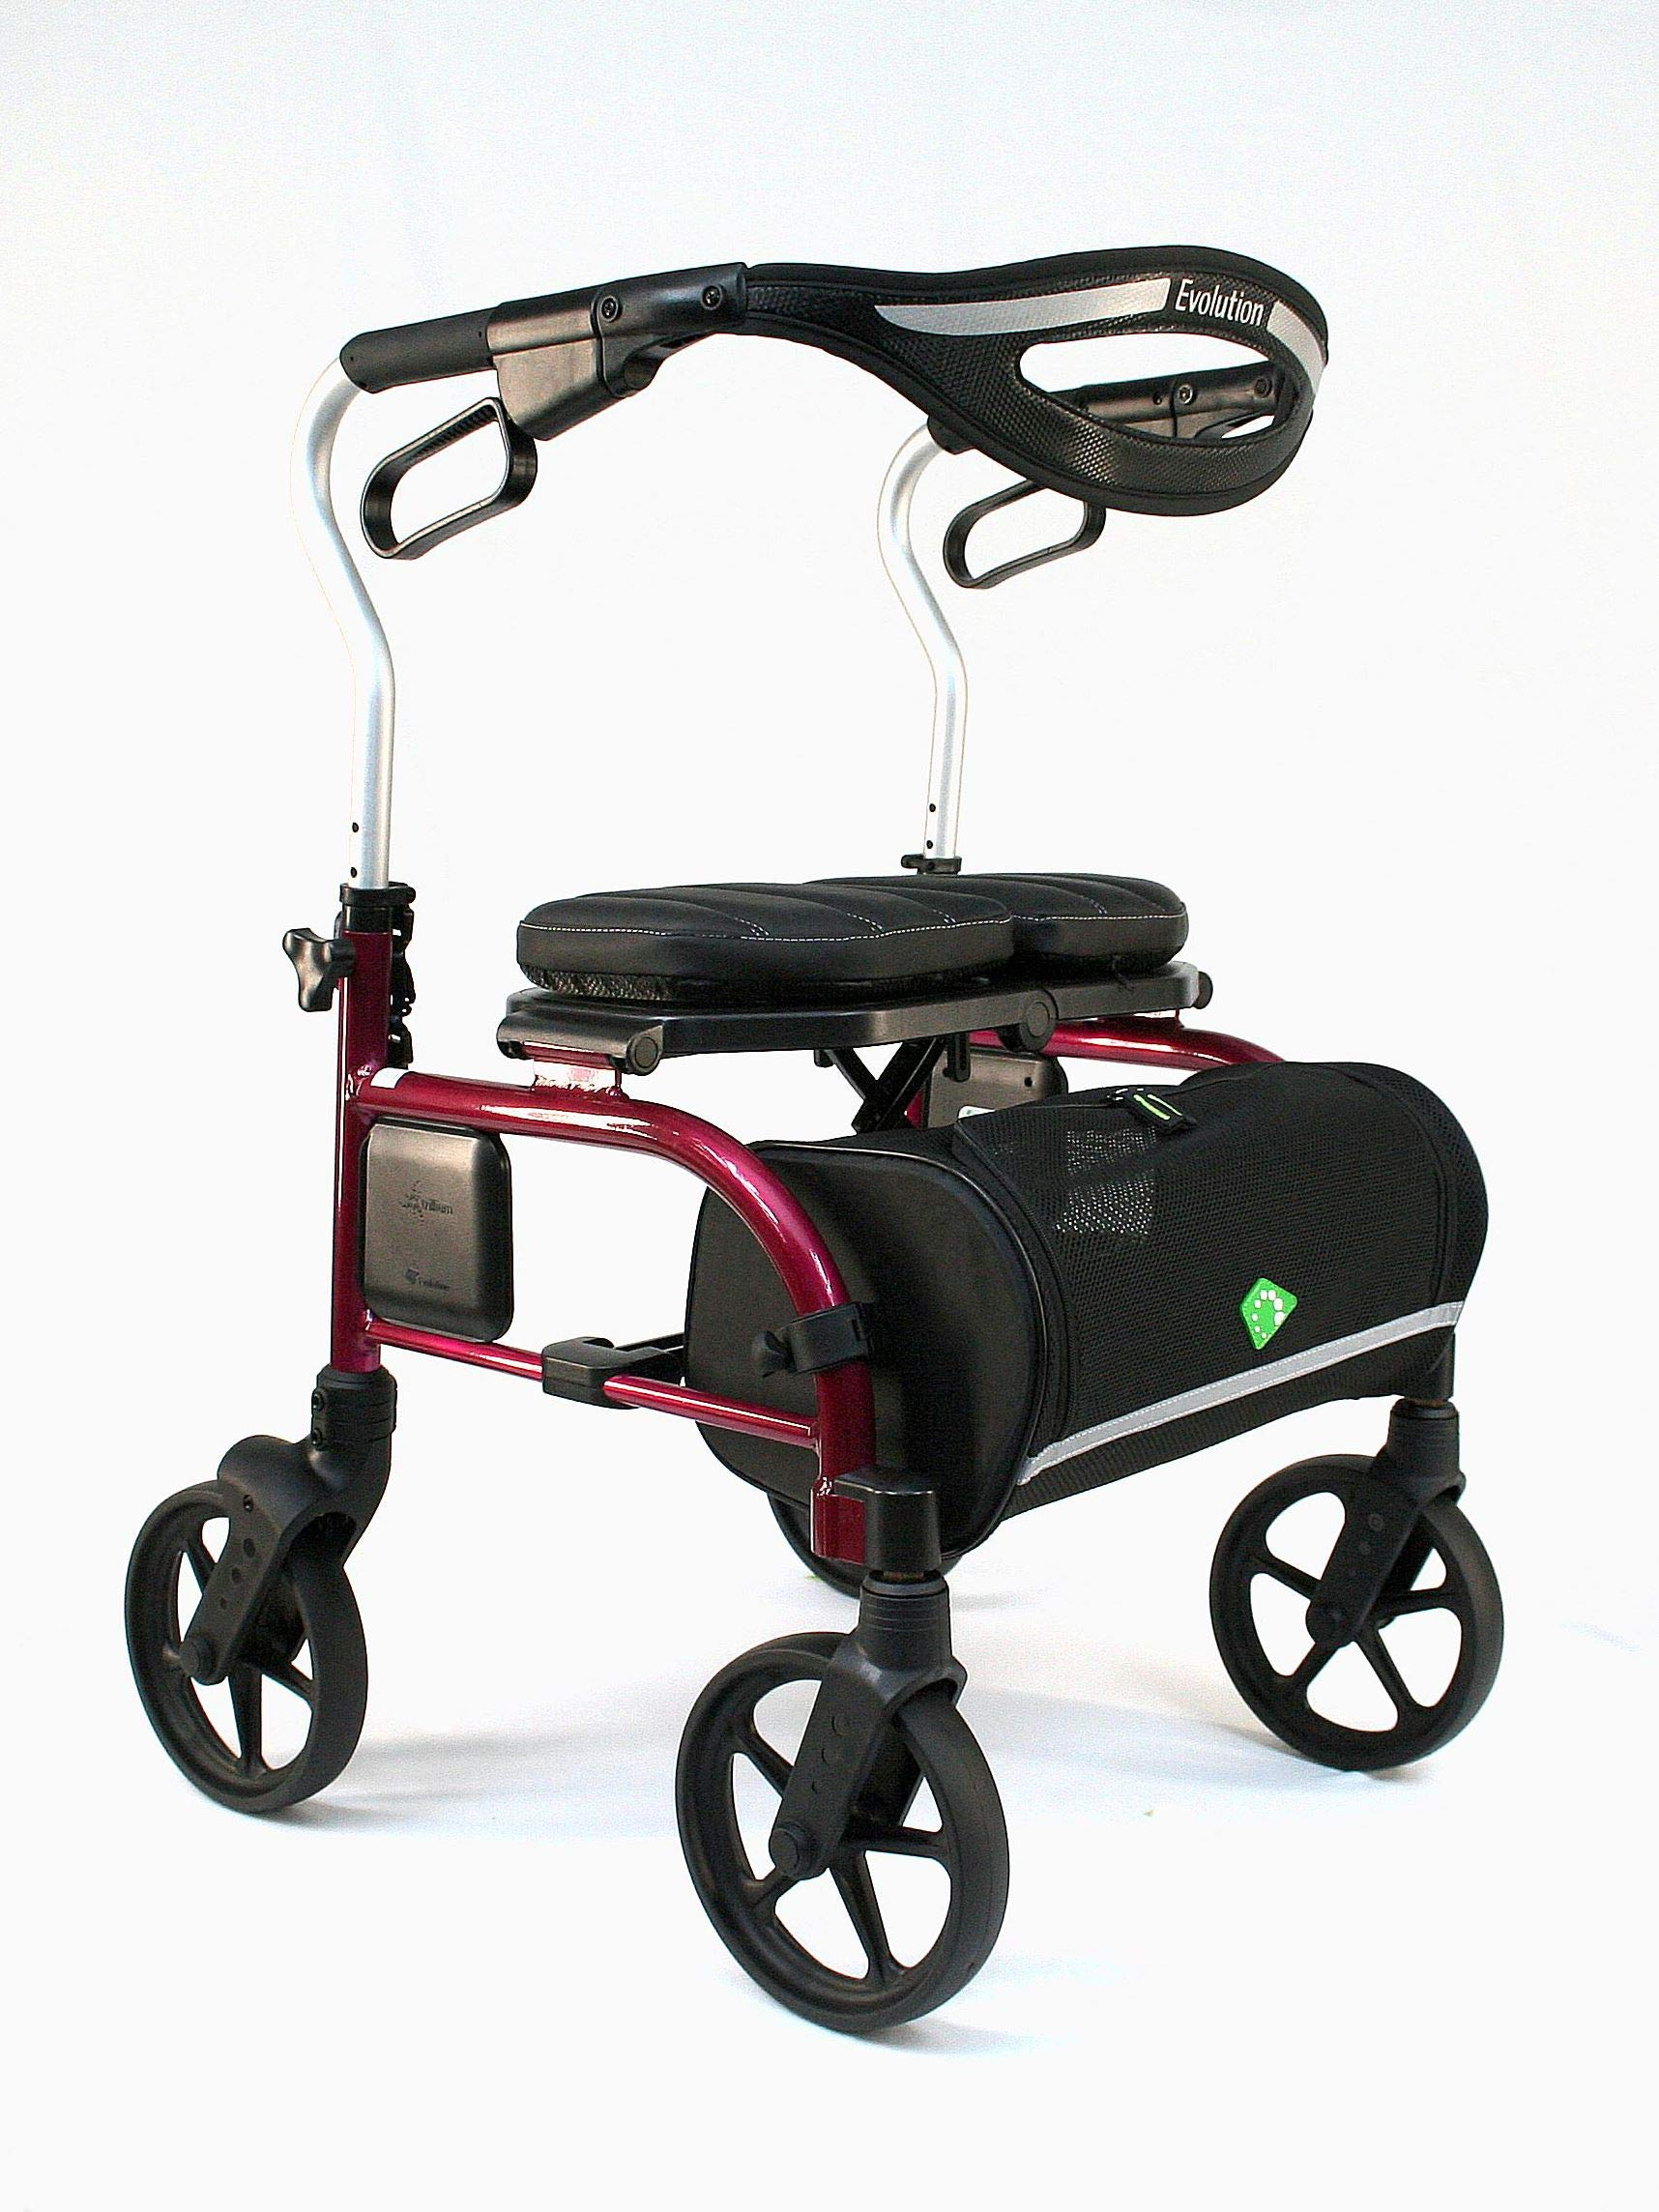 Evolution Trillium Lightweight Medical Walker Rollator with Seat, Large Wheels, Brakes, Backrest, Basket for Seniors Indoor Outdoor use (Shiraz Red, Regular)